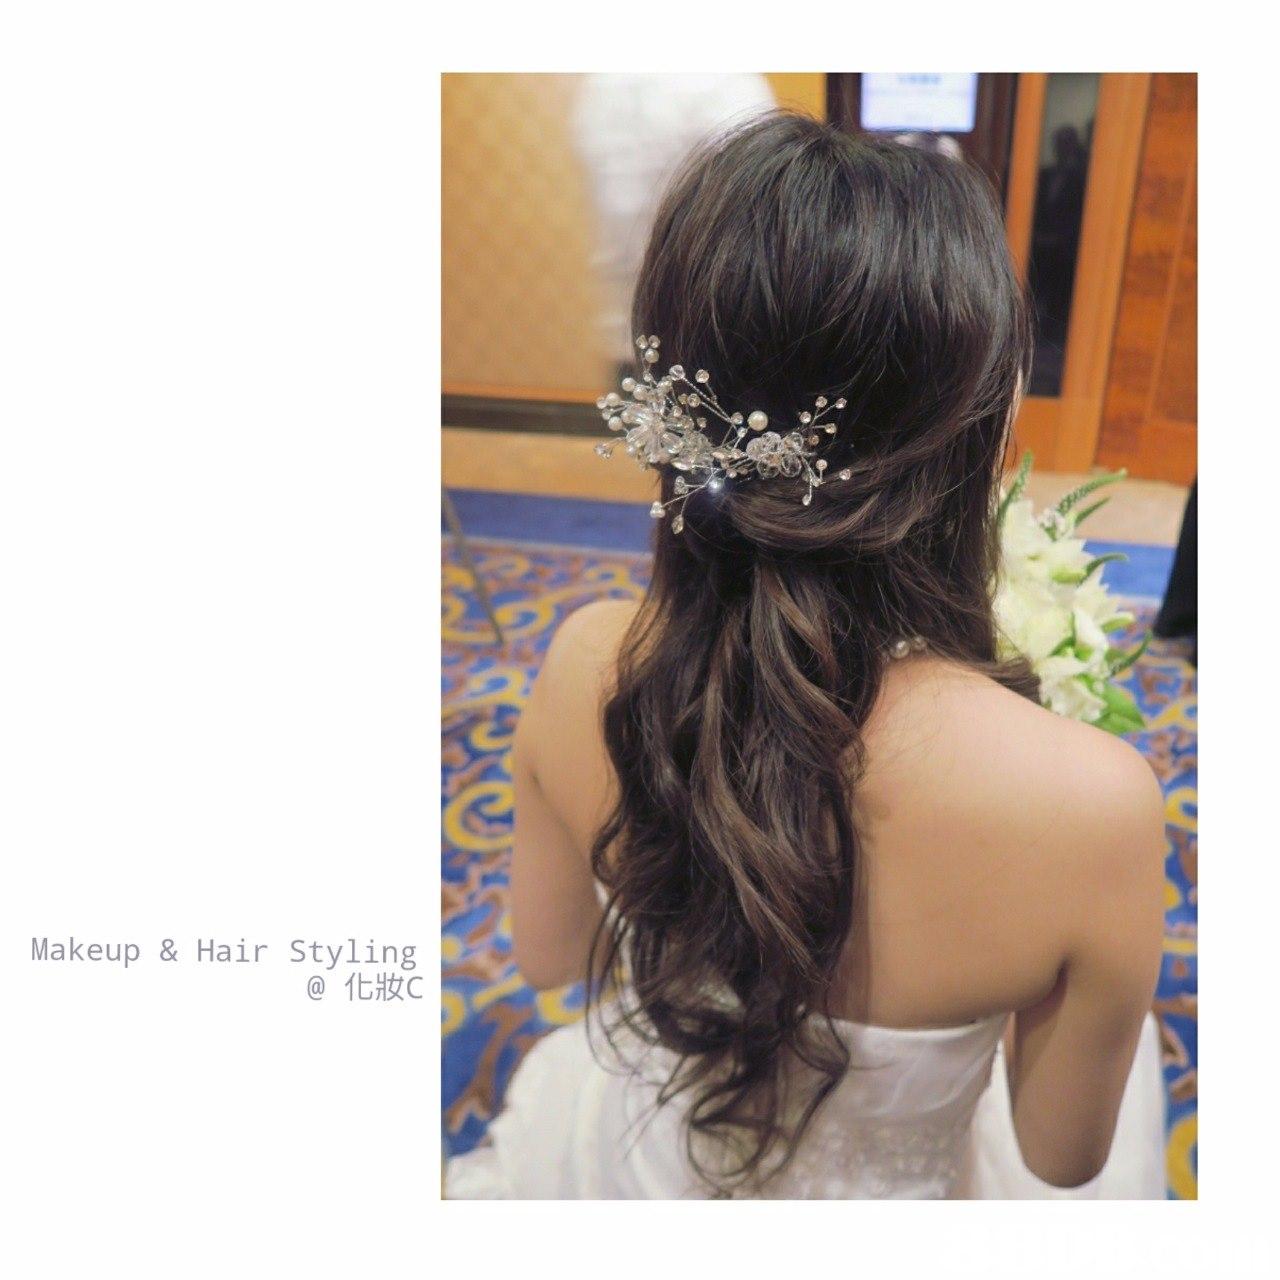 Makeup & Hair Styling @化妝c,hair,headpiece,hair accessory,jewellery,hairstyle